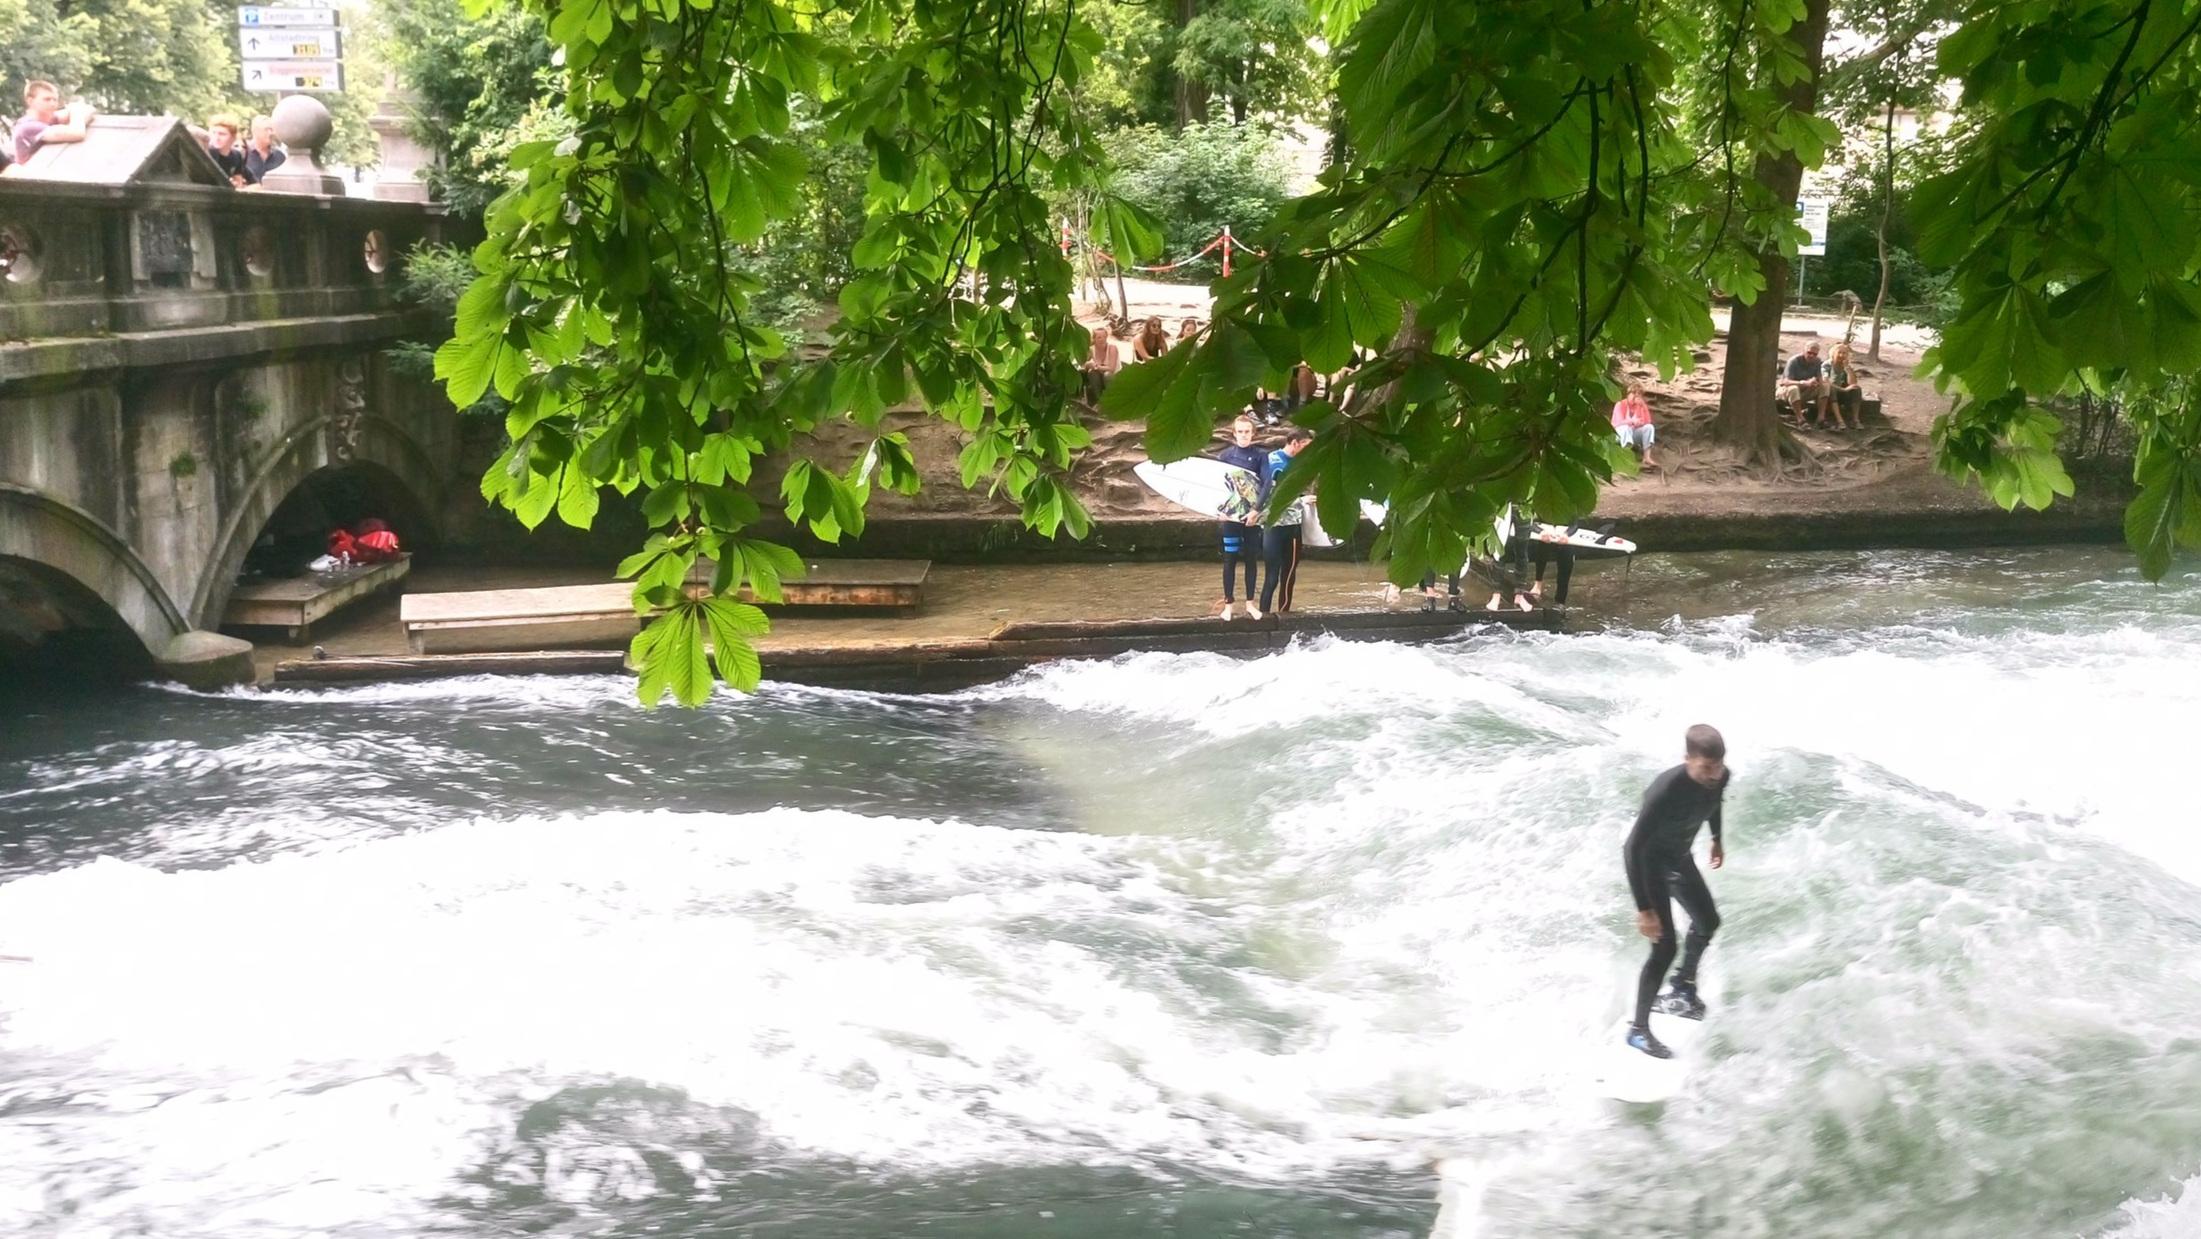 River surfing in Munich, Germany